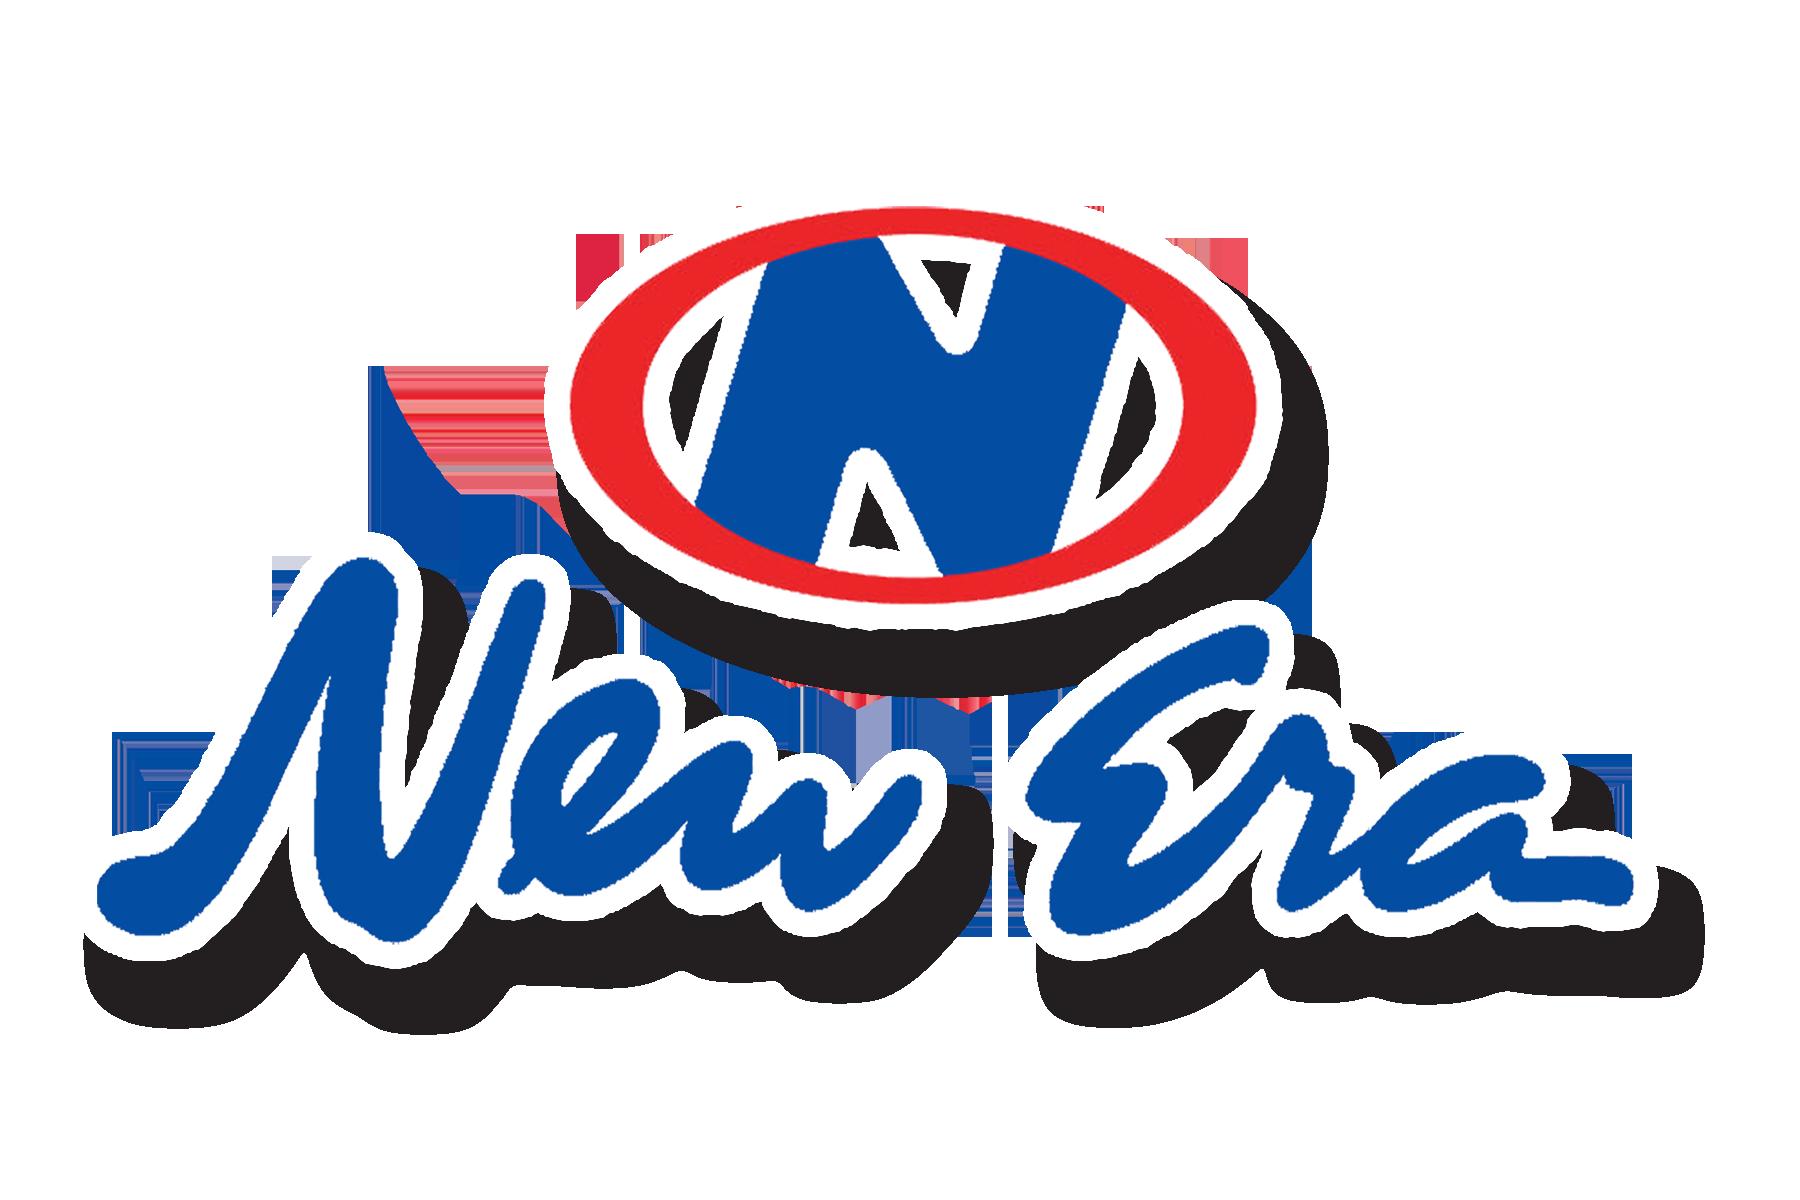 new era logo wwwpixsharkcom images galleries with a